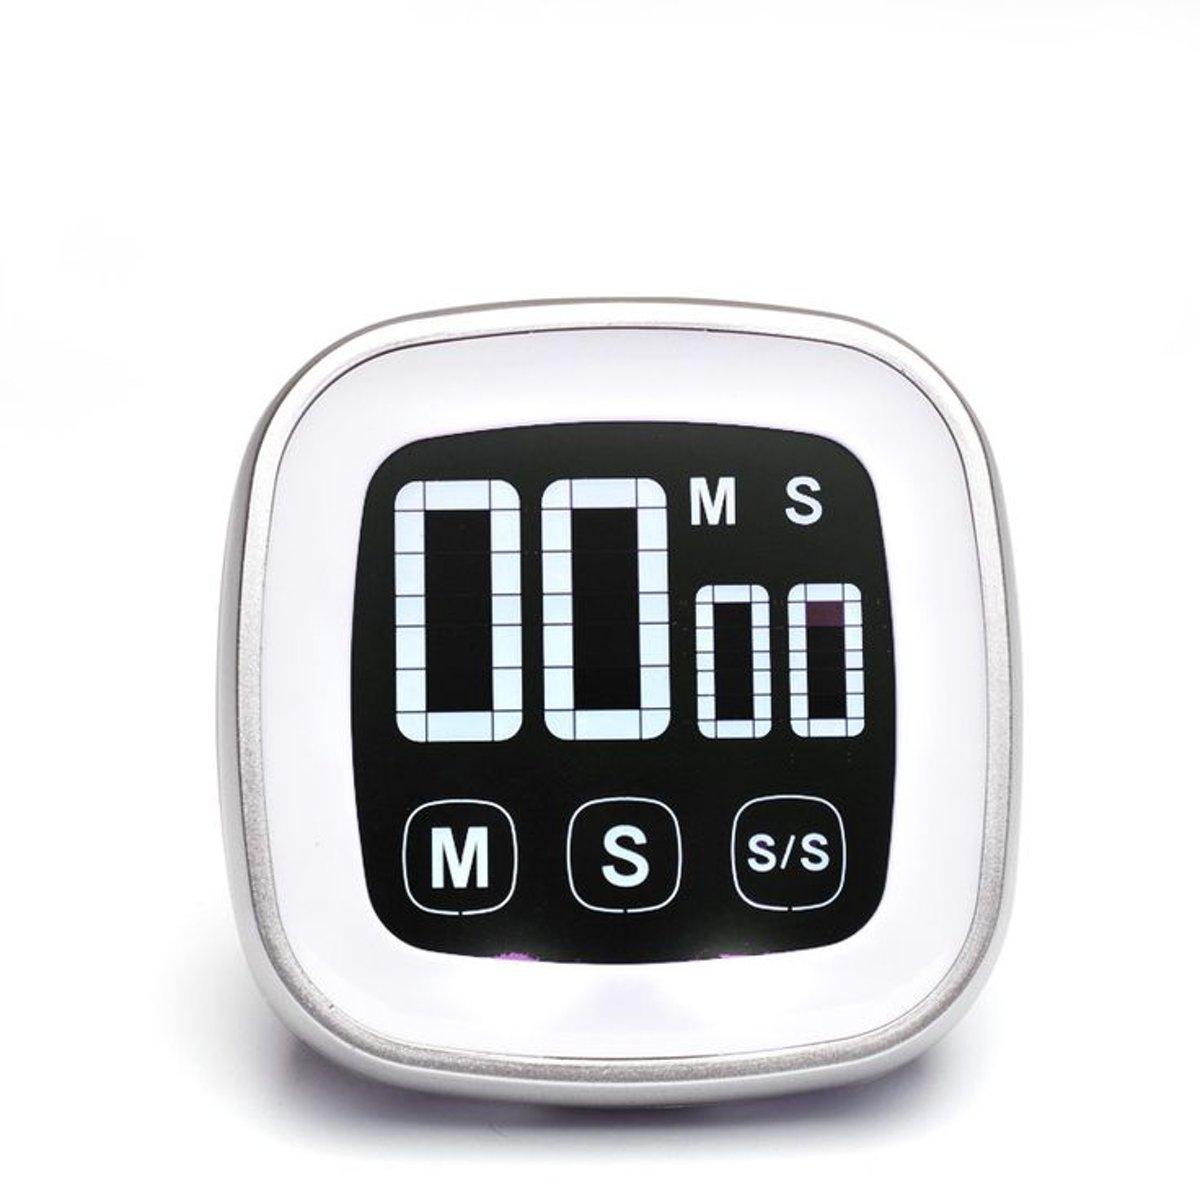 Digitale Timer - Op- en Aflopend - LCD Scherm - MasterClass kopen